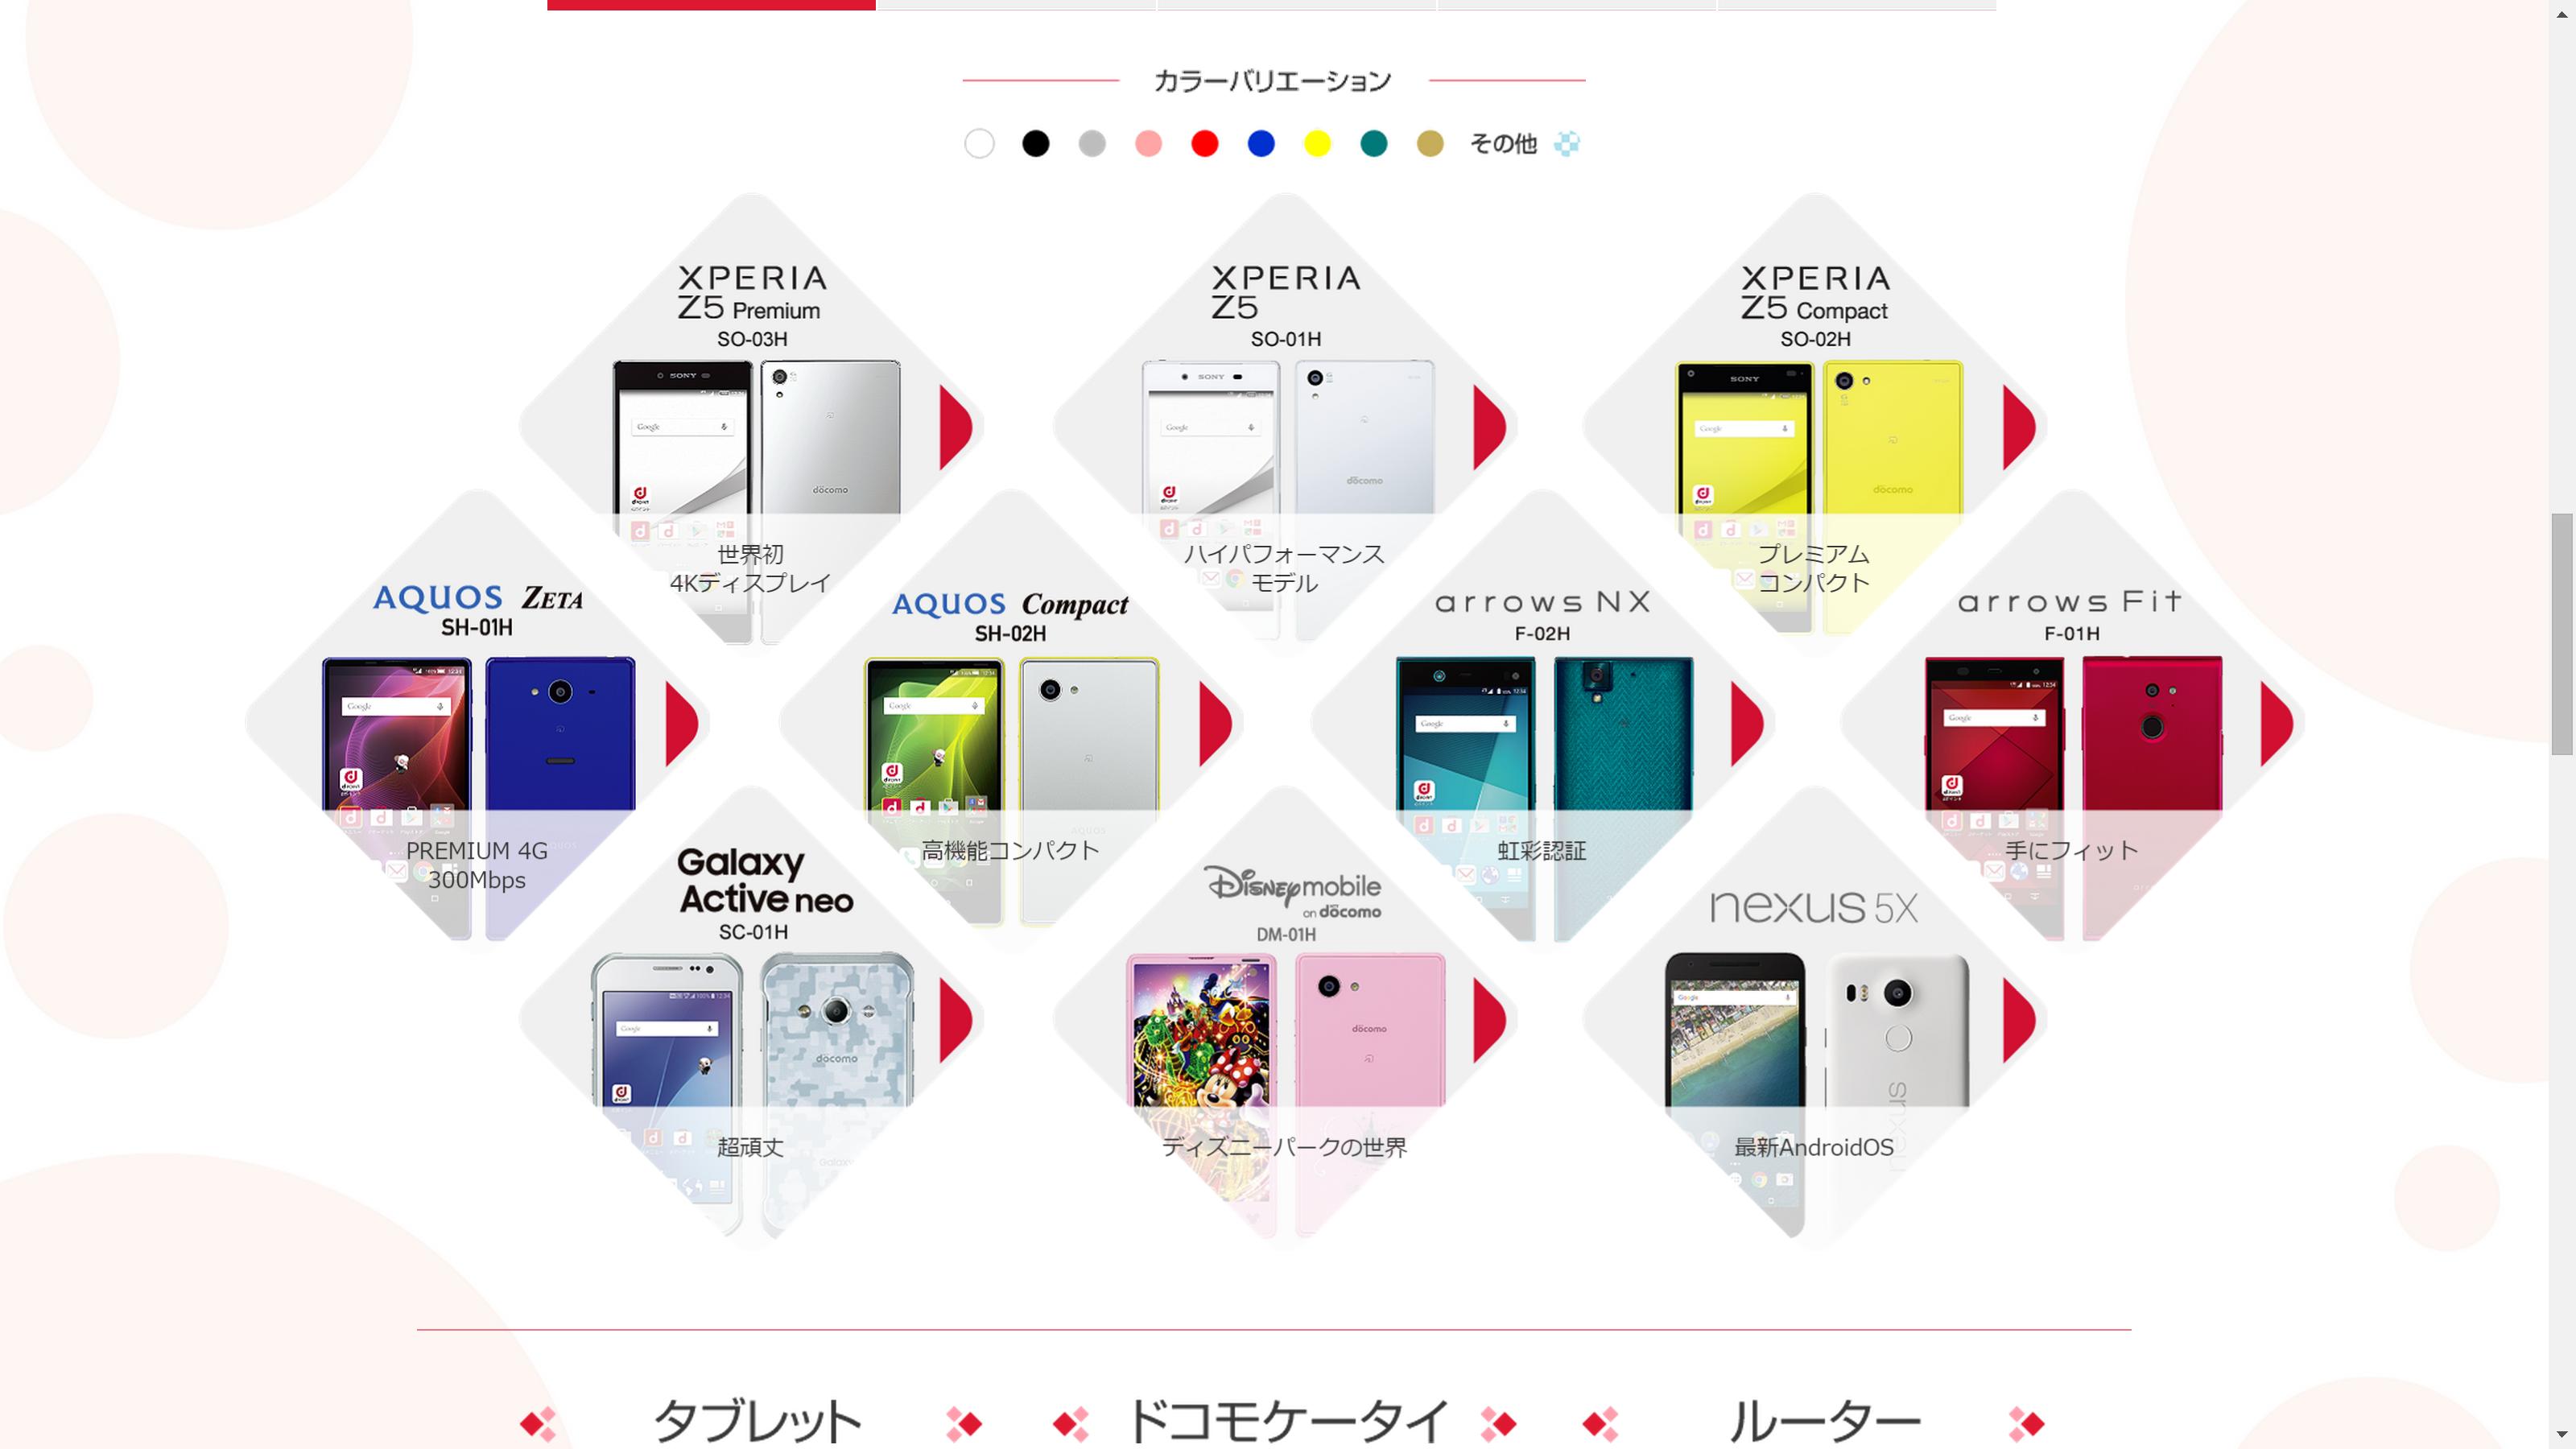 NTT docomo Product Line-Up 2015-2016